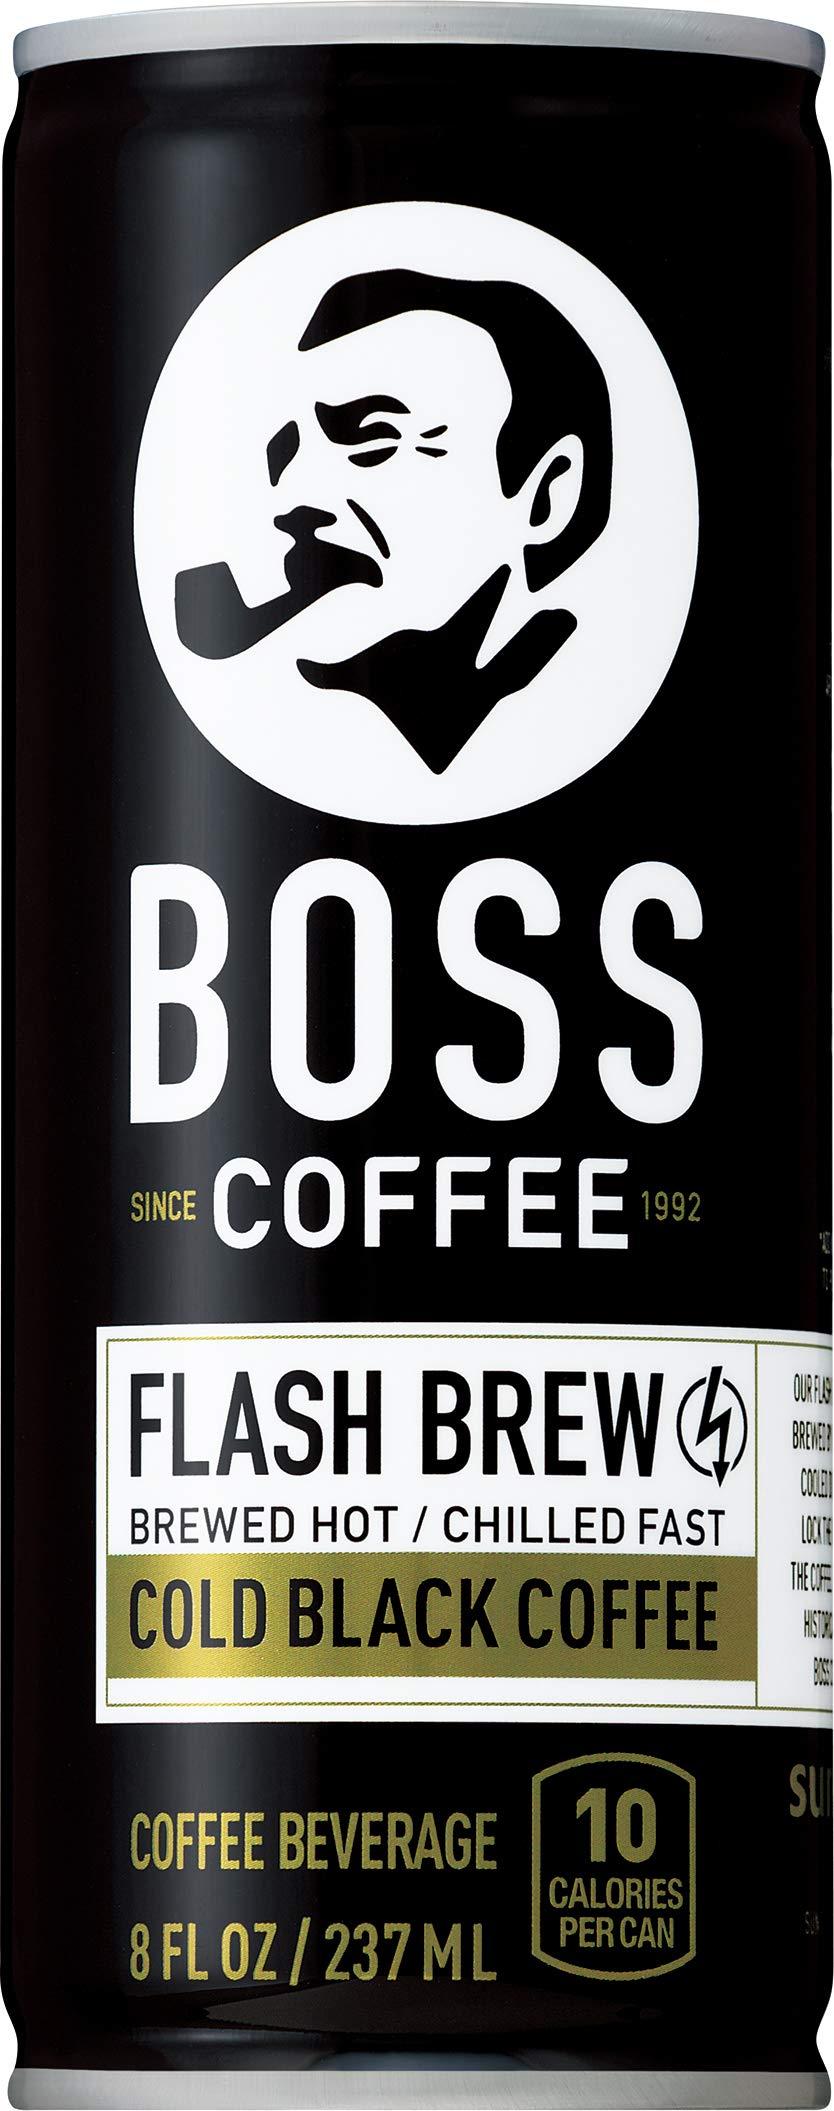 BOSS COFFEE by Suntory - Japanese Coffee Drink - Imported Coffee - Flash Brewed - Gluten Free, Sugar Free, Dairy Free, Keto, Vegan. (Original Black) (8 oz) (Pack of 12) by BOSS